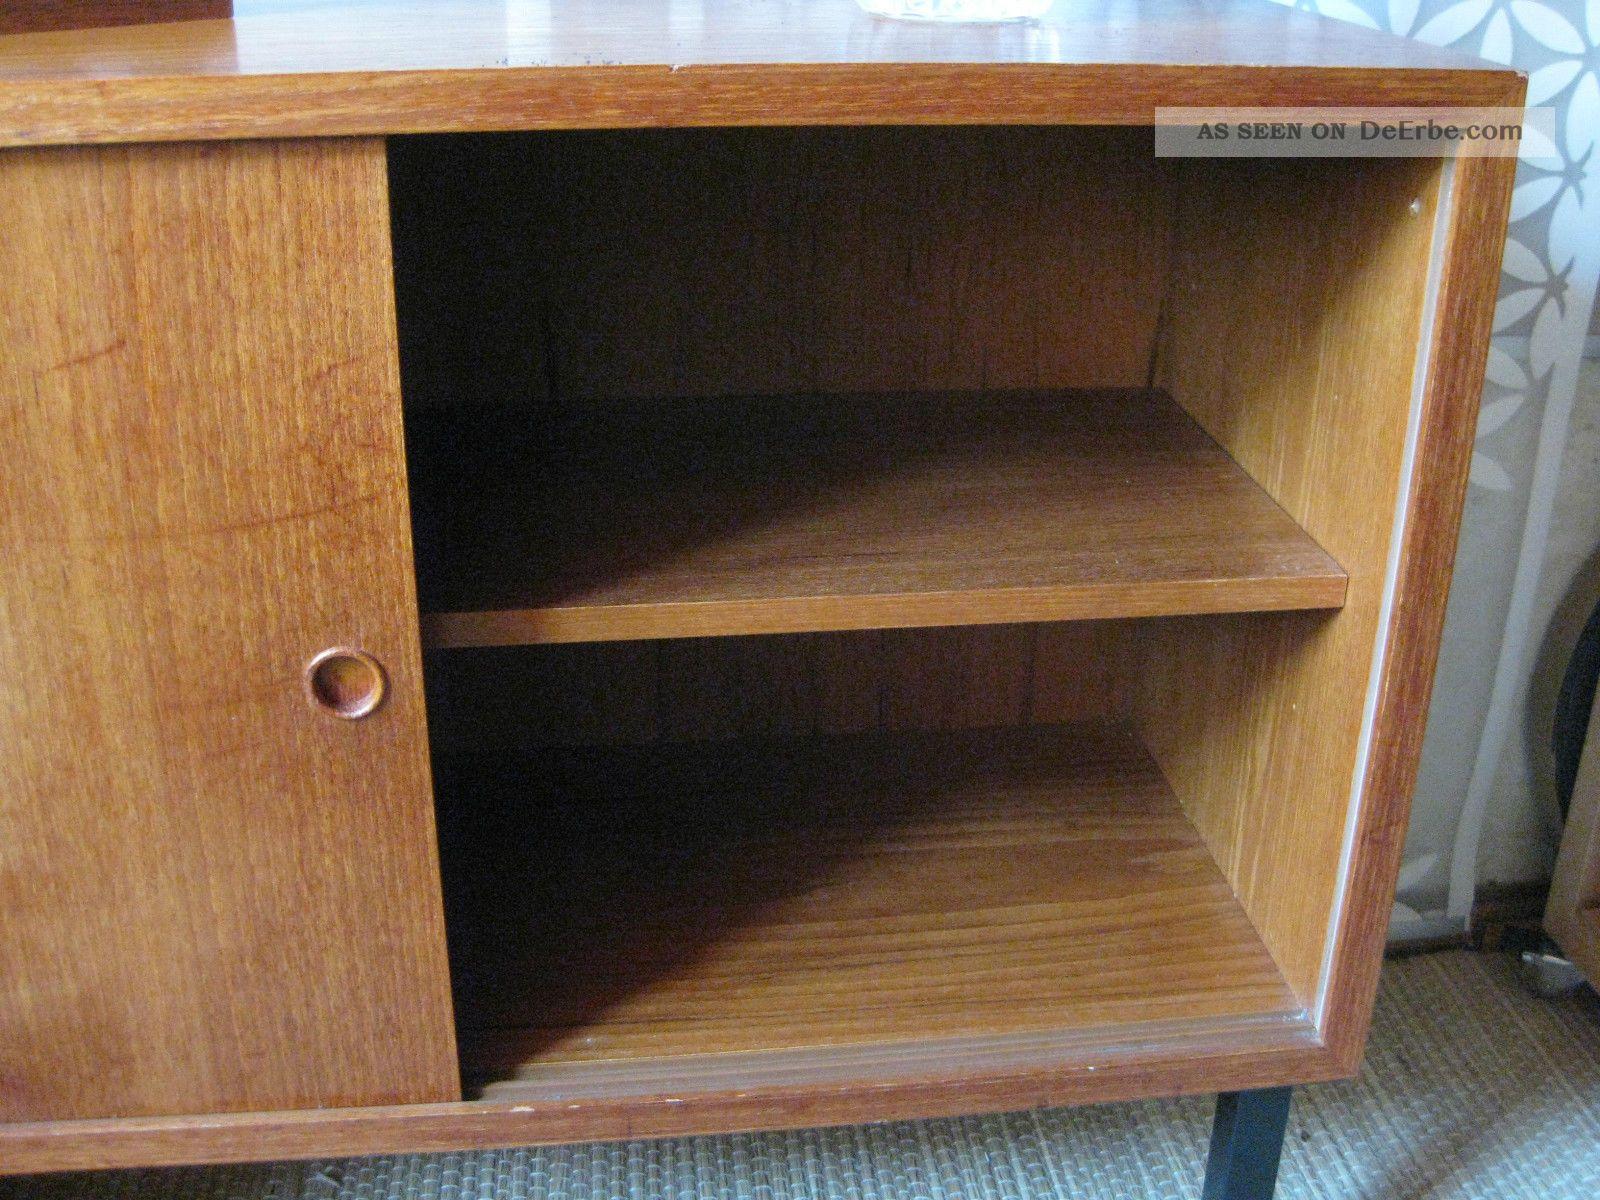 60er jahre kommode sideboard string ra danish modern schiebet ren schrank. Black Bedroom Furniture Sets. Home Design Ideas